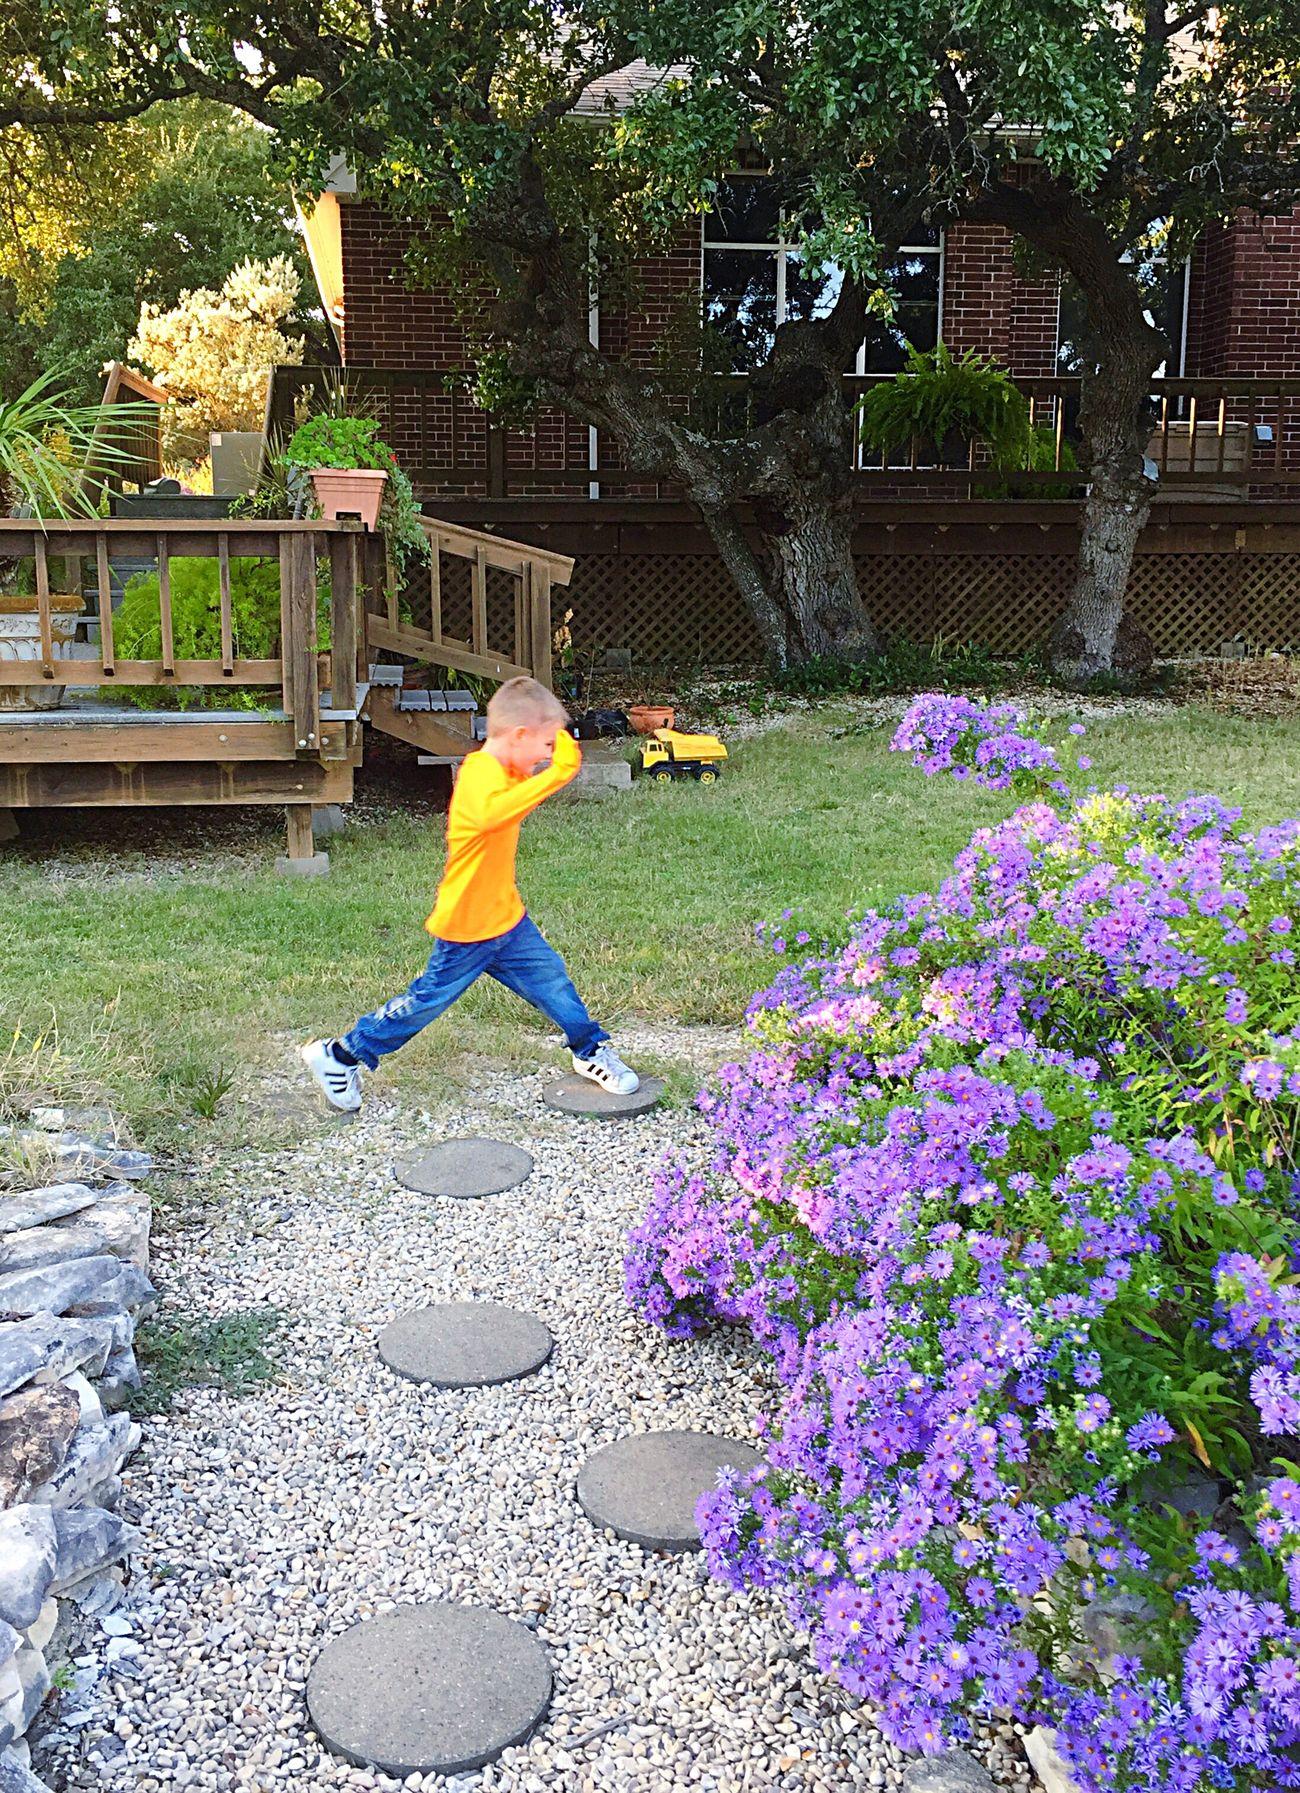 My boy avoiding poisonous lava in the Enchanted Garden:)